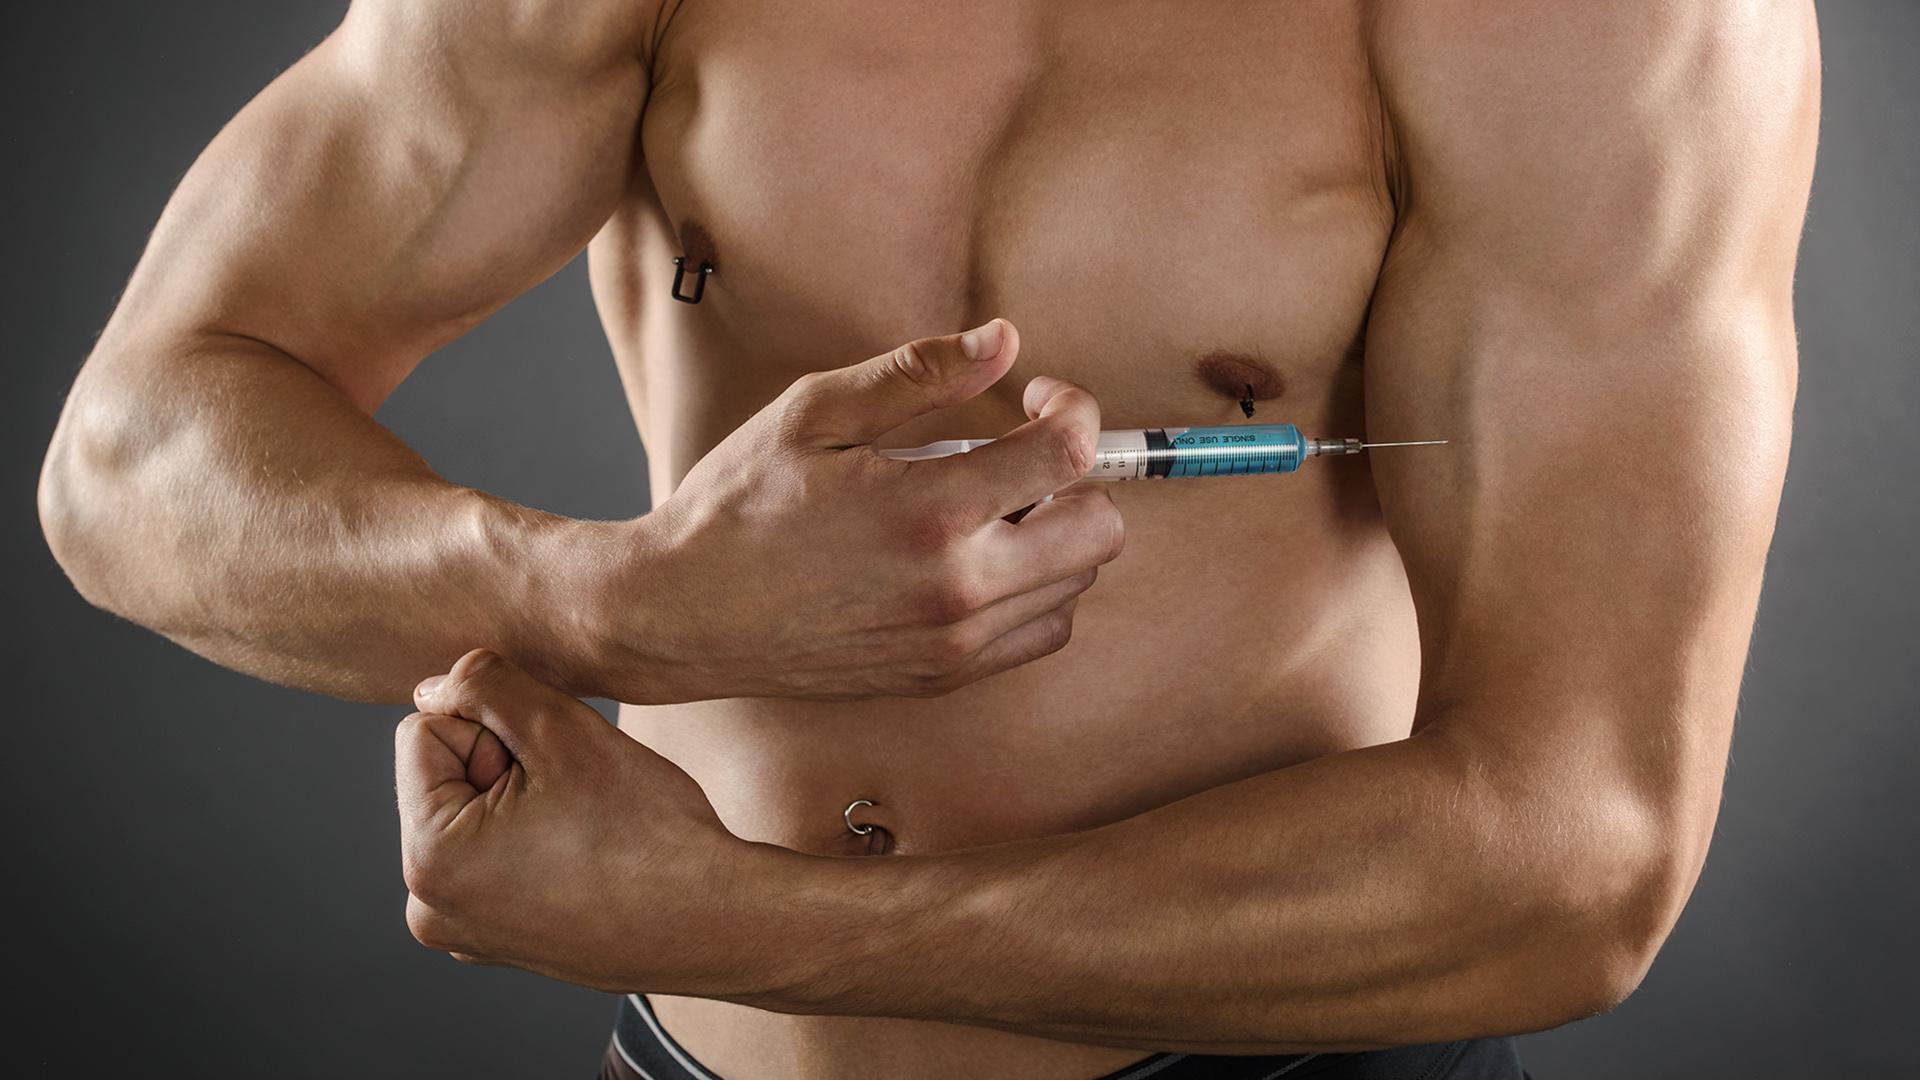 Фармакология и фитнес